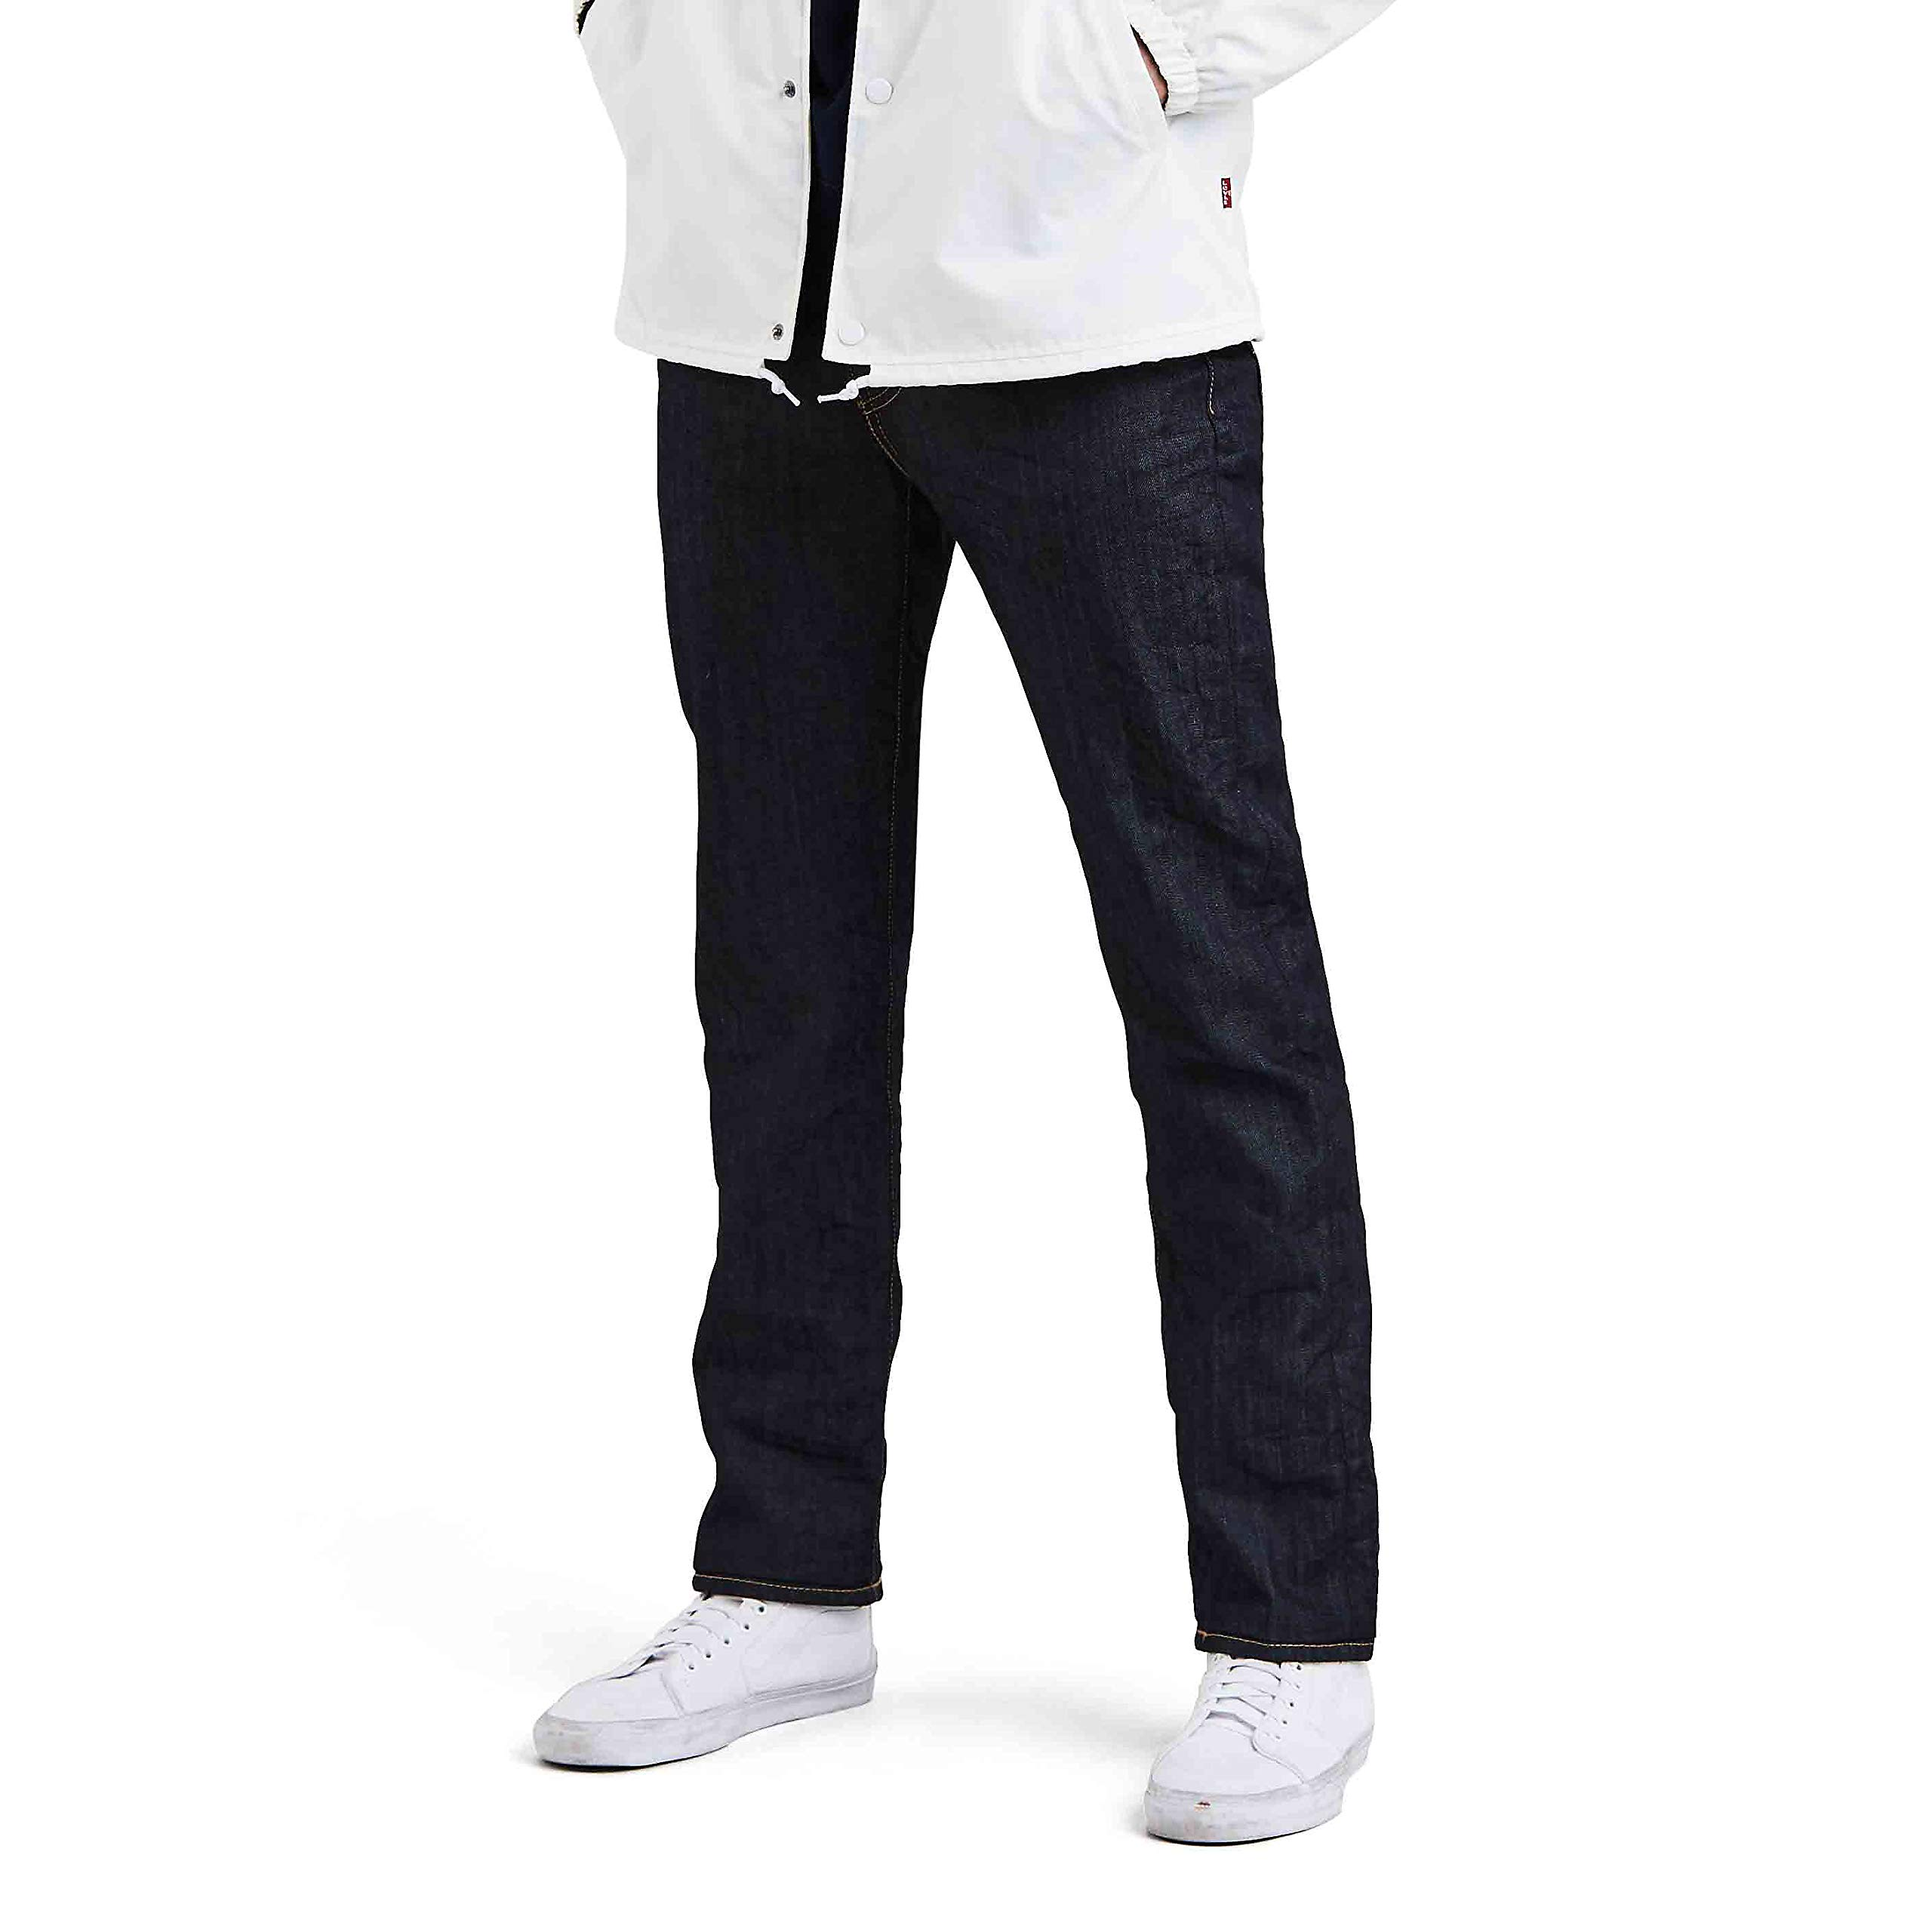 Levi's Mens 511 Slim Fit Stretch Jeans, Blue Flame, 36W x 34L